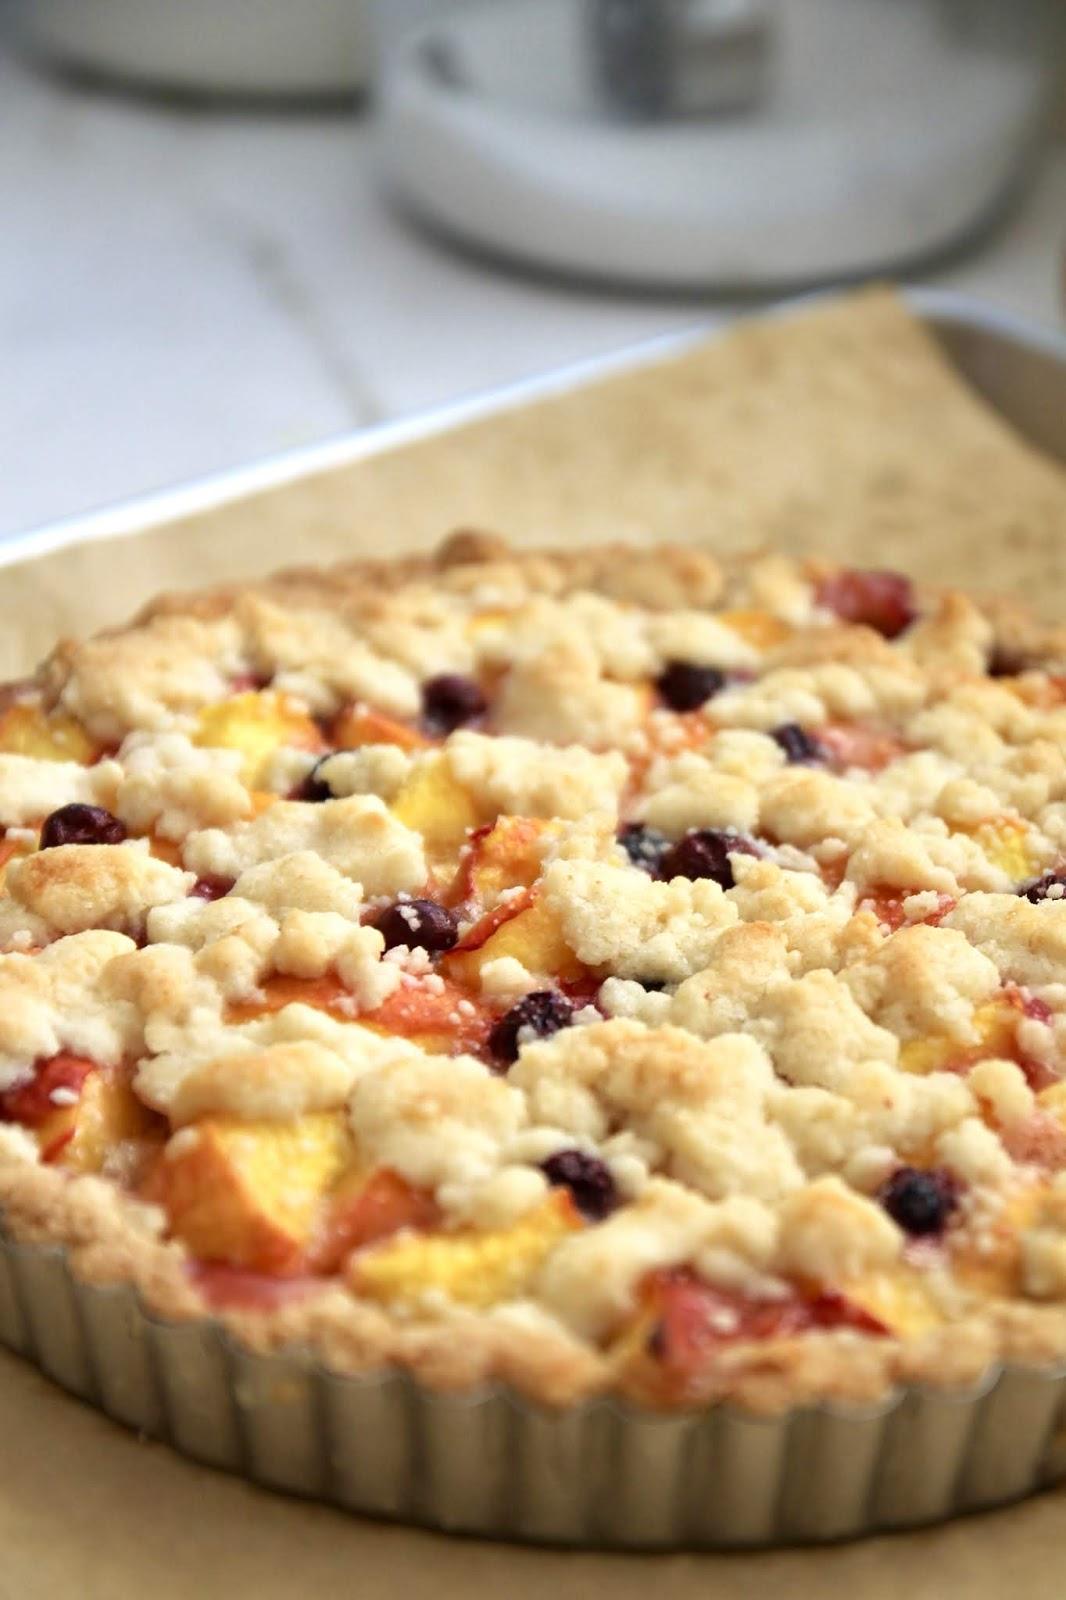 Jenny Steffens Hobick: Peach & Blueberry Crumble Tart